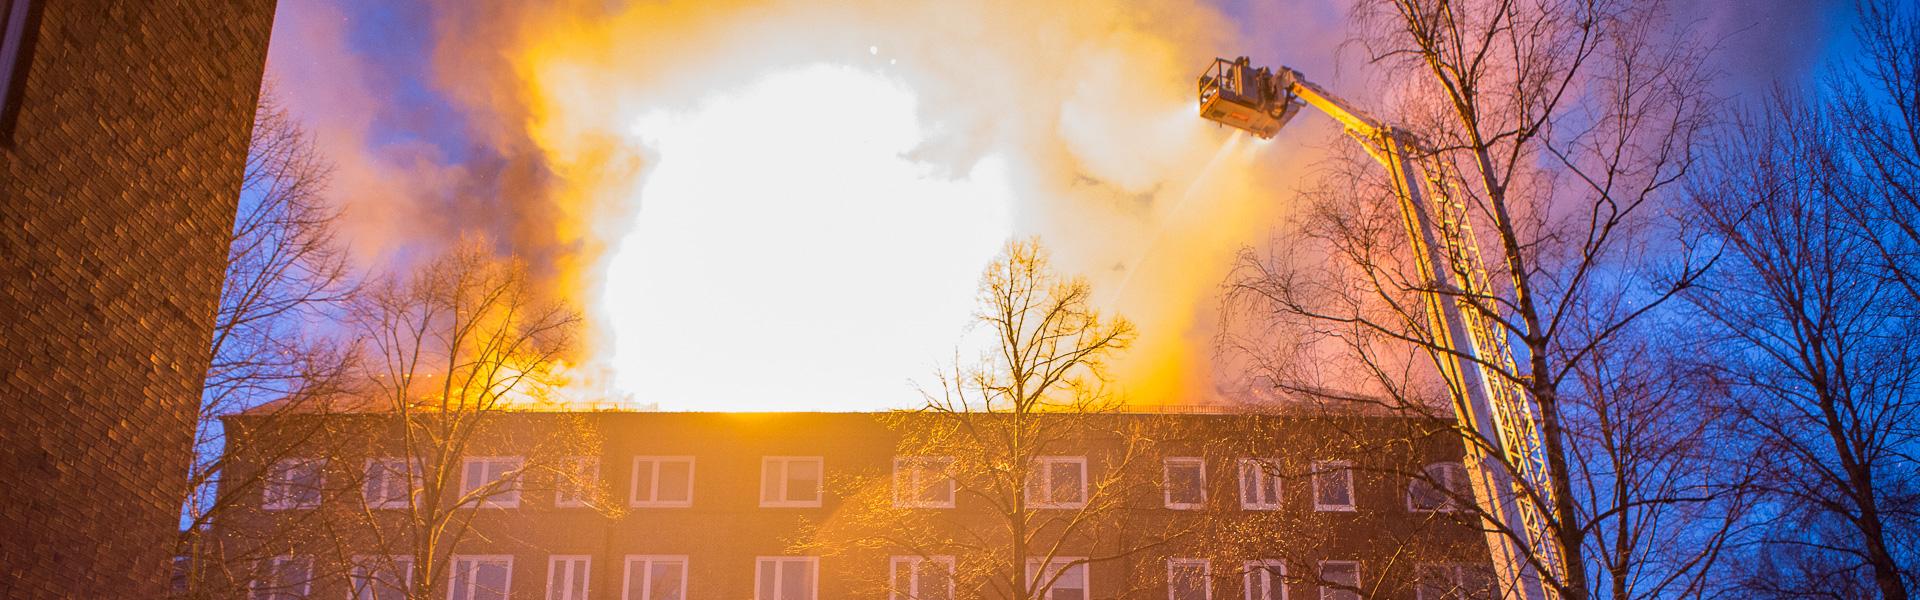 07.03.2018 – Dachstuhlbrand in Hamburg-Borgfelde